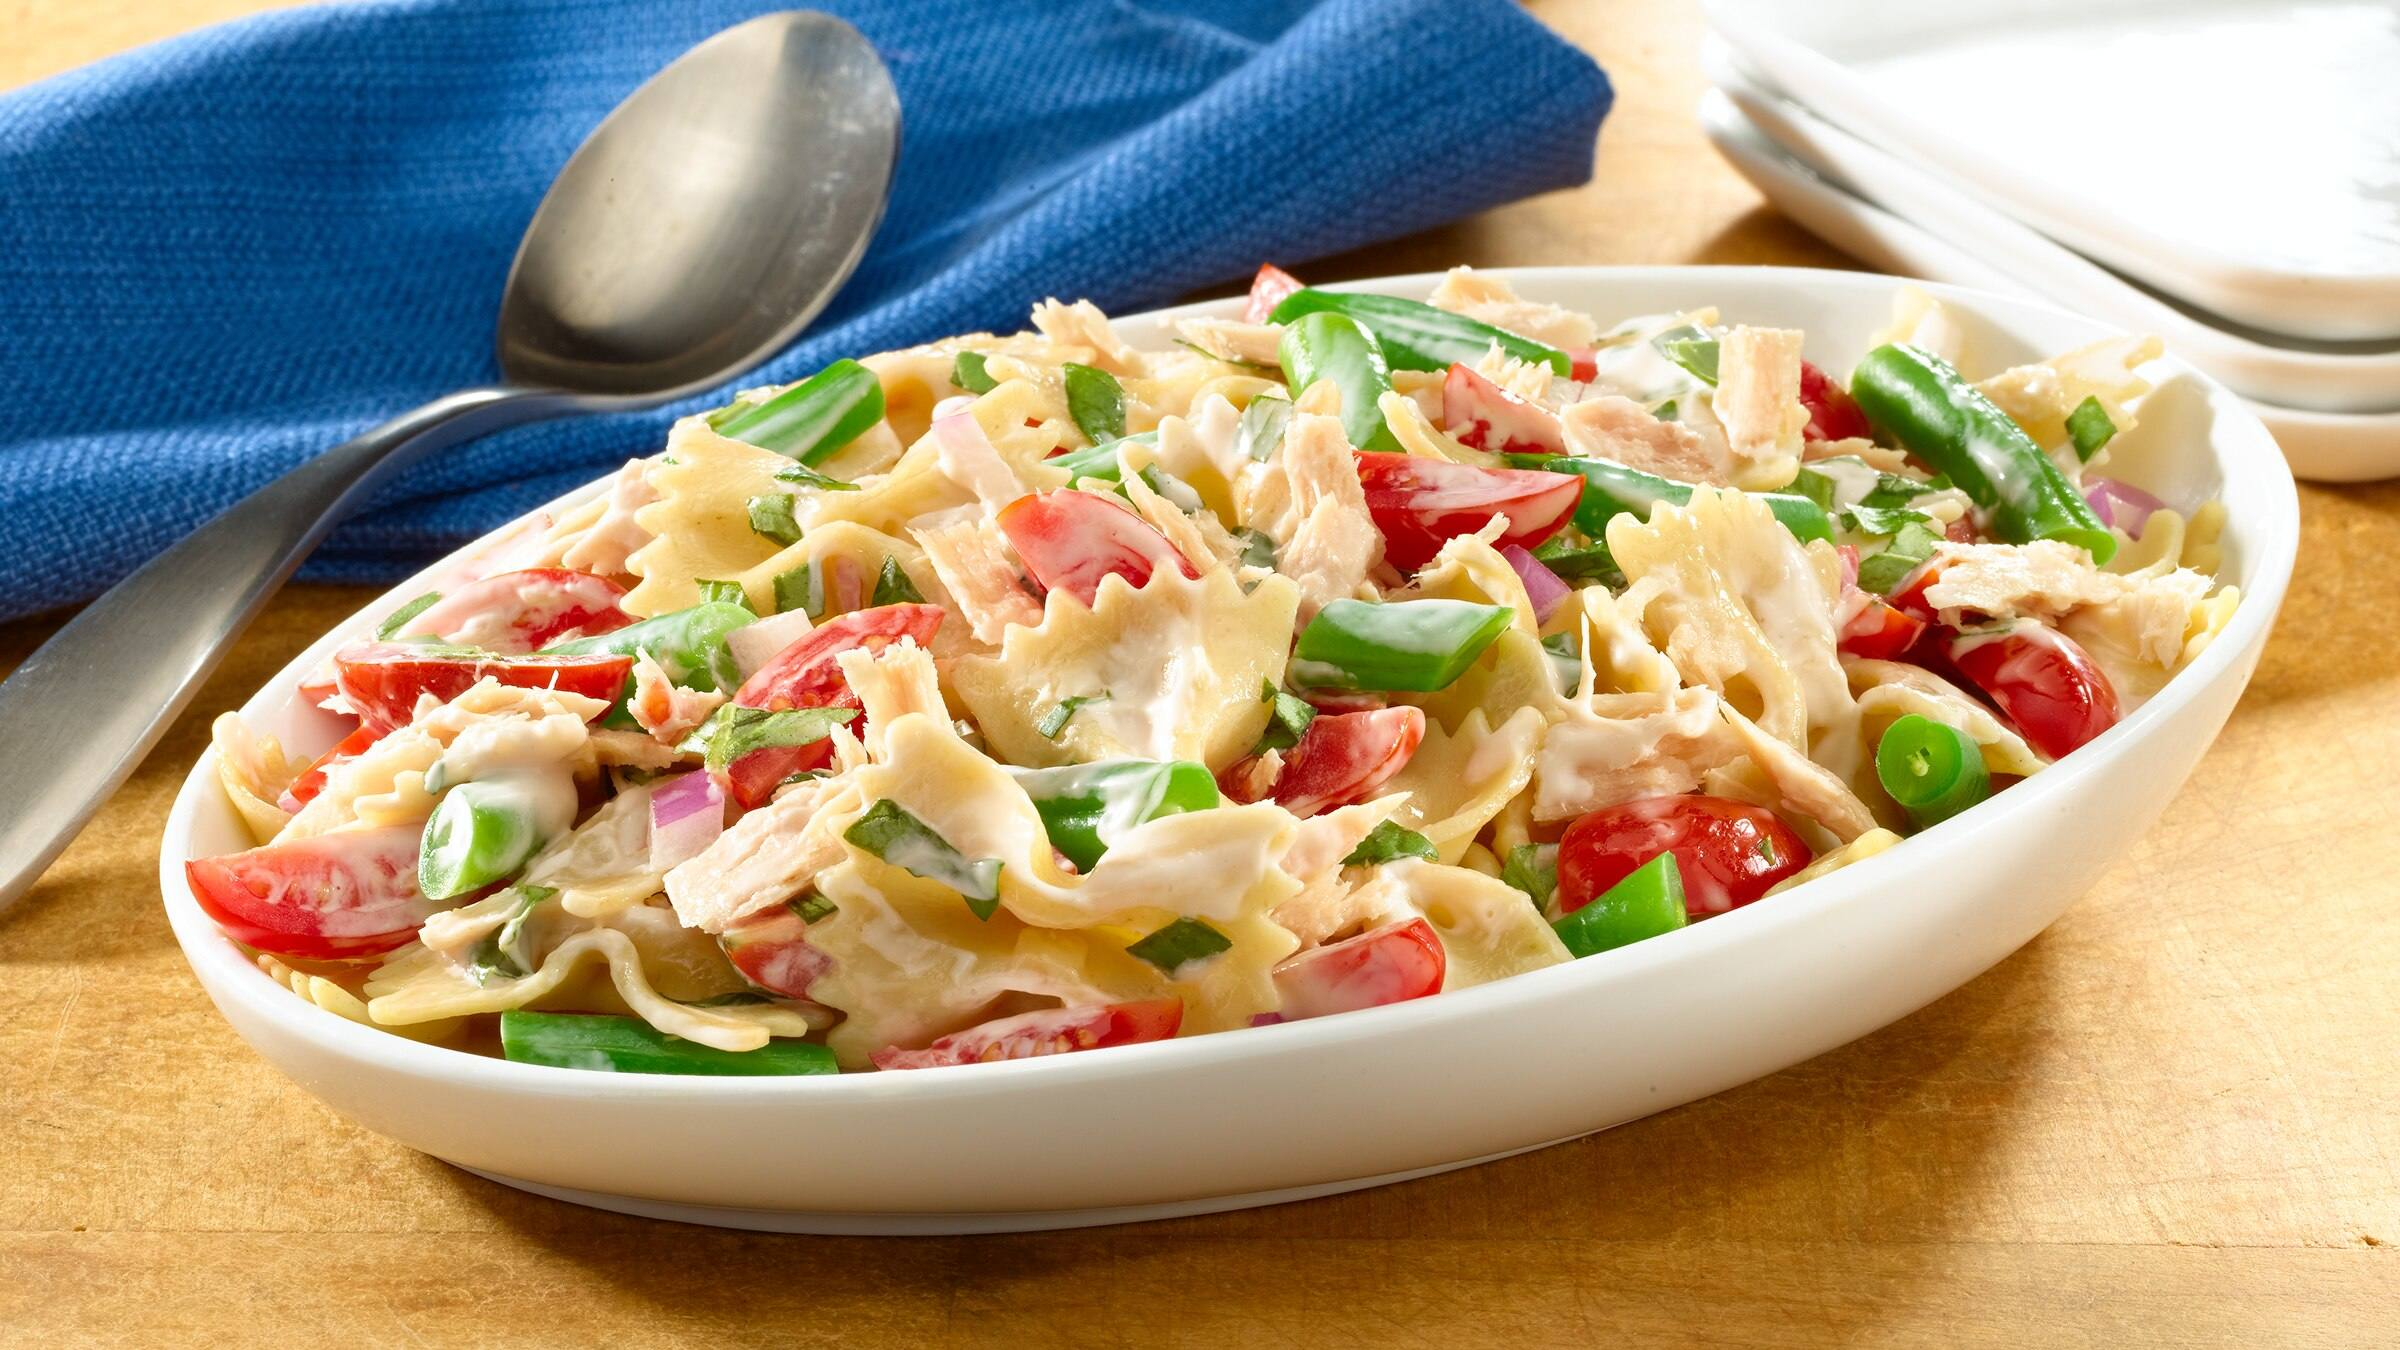 Tuna & Bow Tie Pasta Salad Recipe